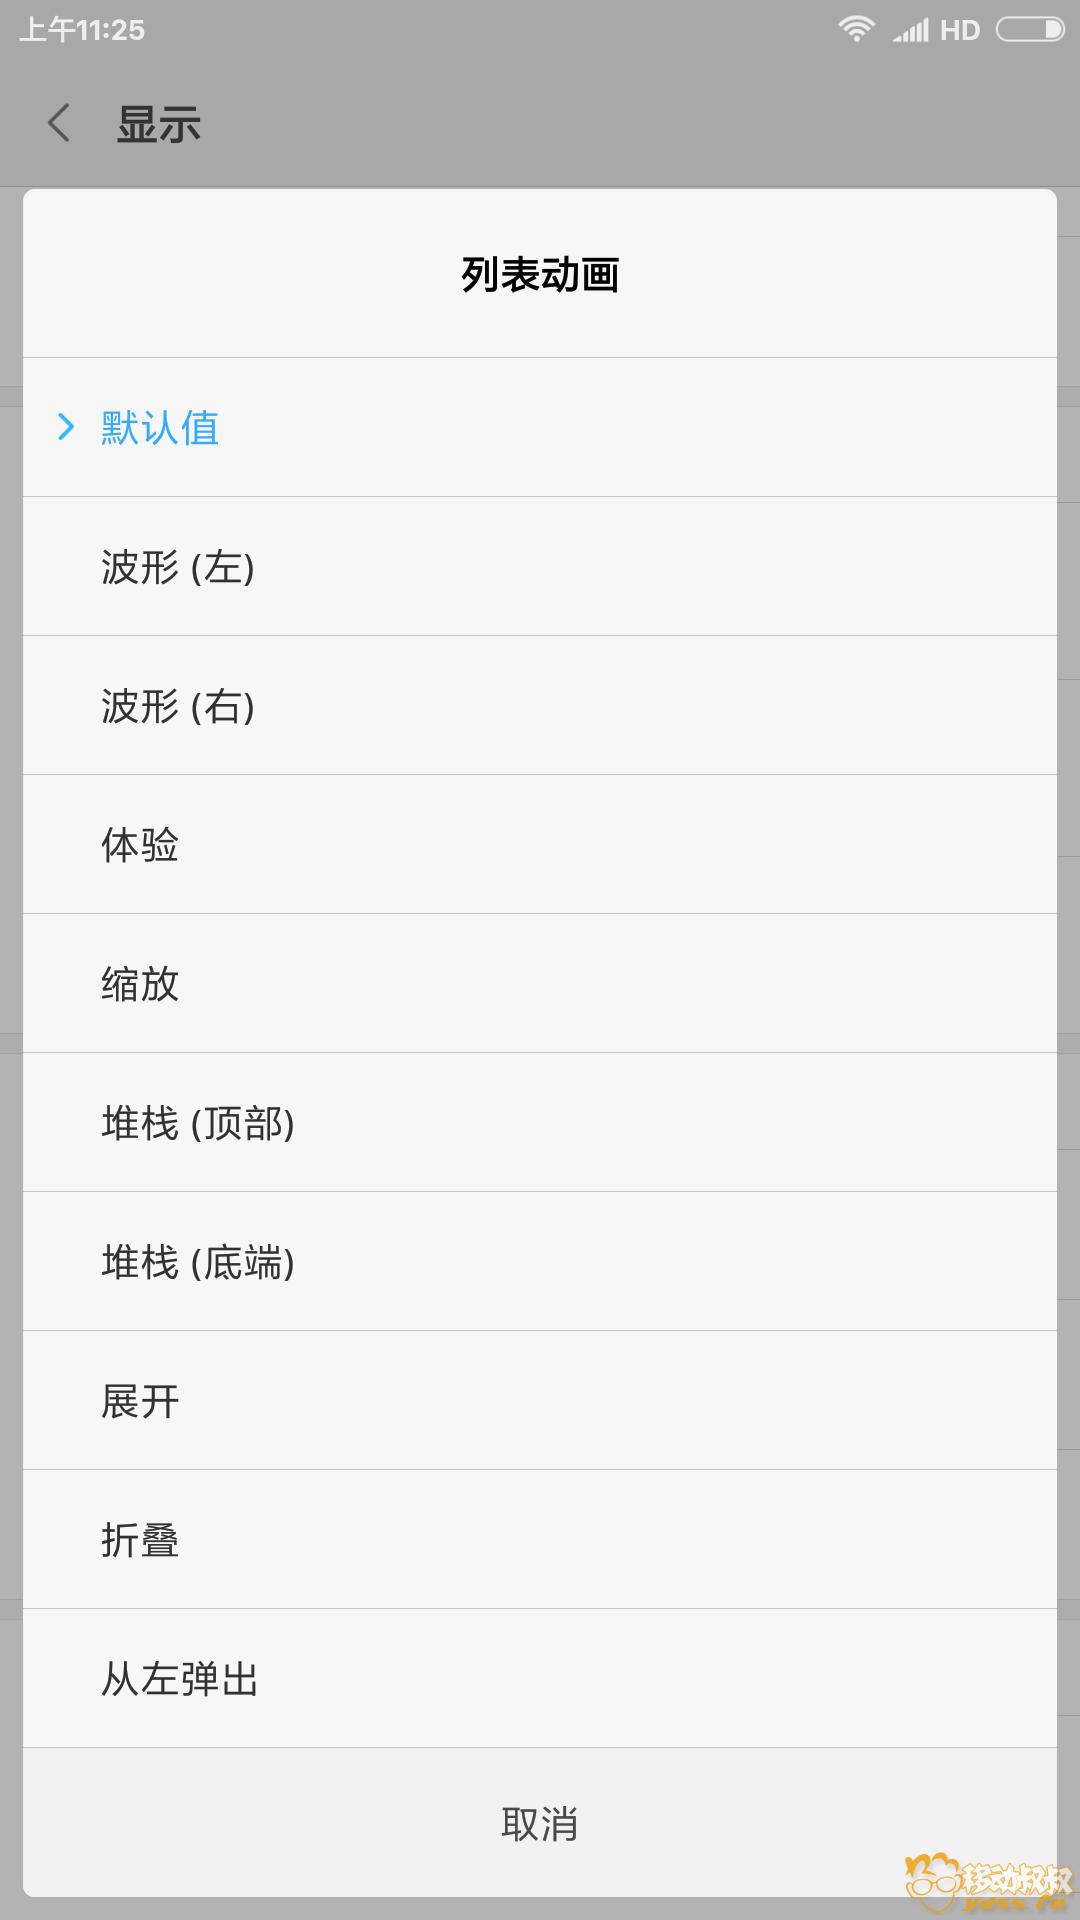 Screenshot_2018-05-04-11-25-01-789_com.android.settings.png